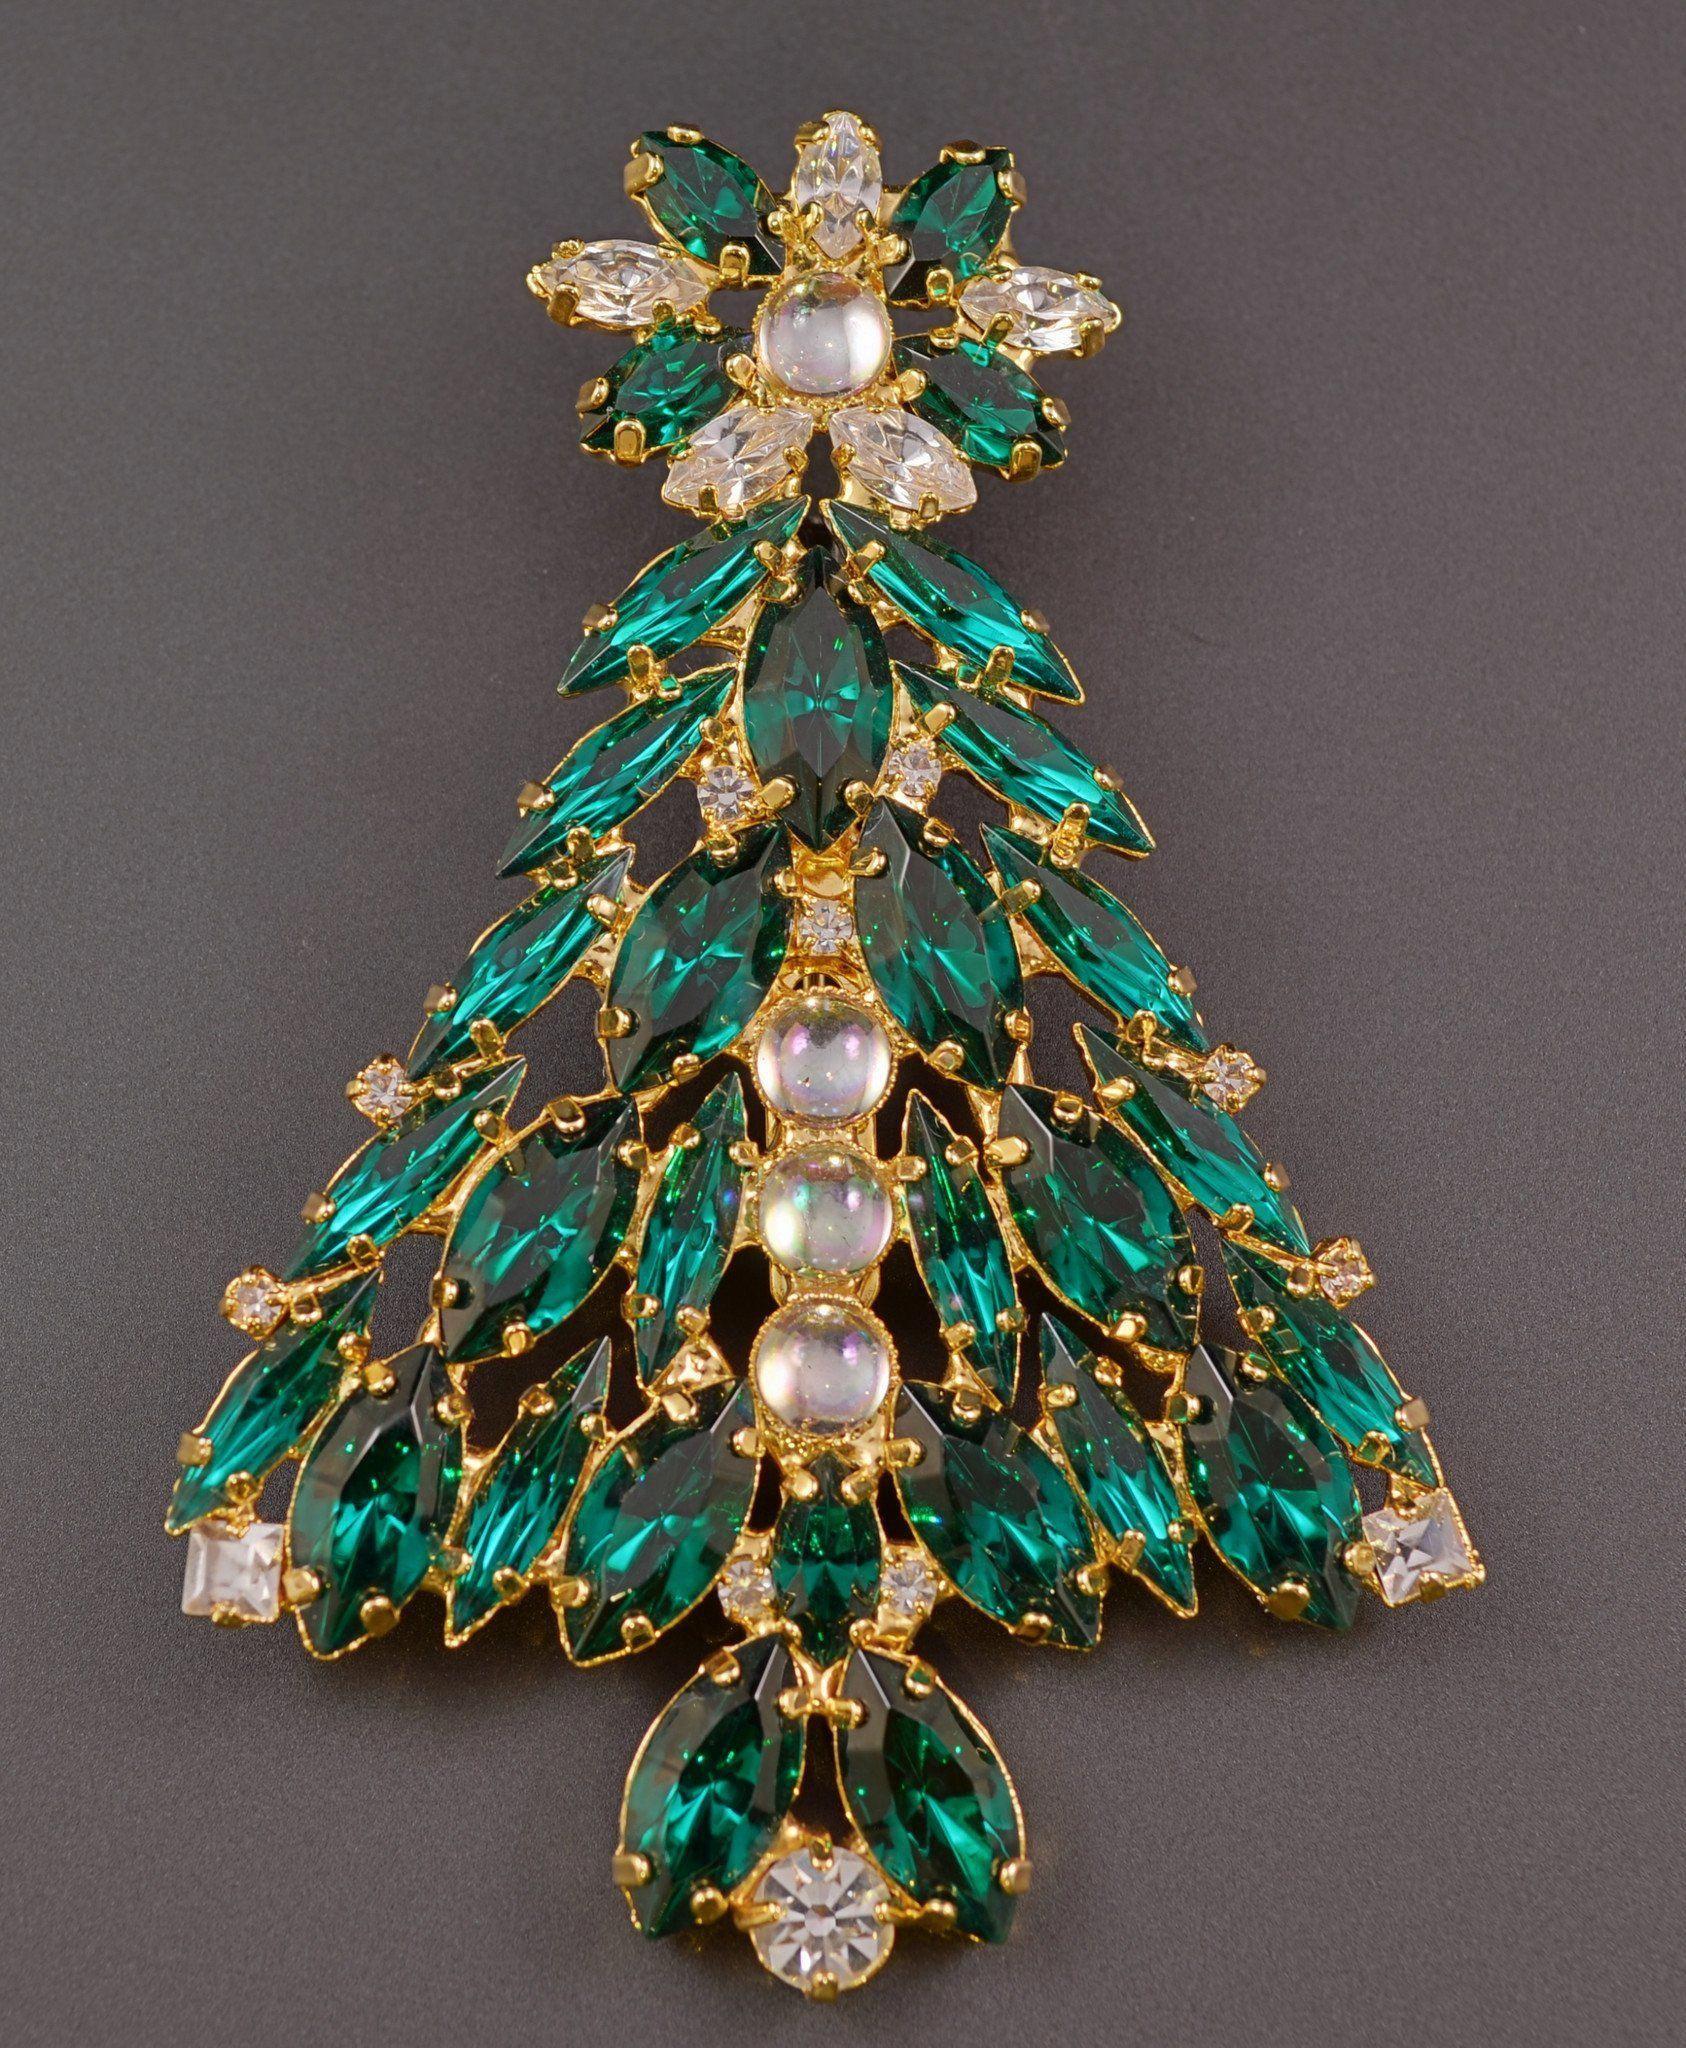 Estate Jewelry Store Near Me Jewellery Tools Japan Jewelry Christmas Tree Crystal Christmas Tree Jewelry Tree